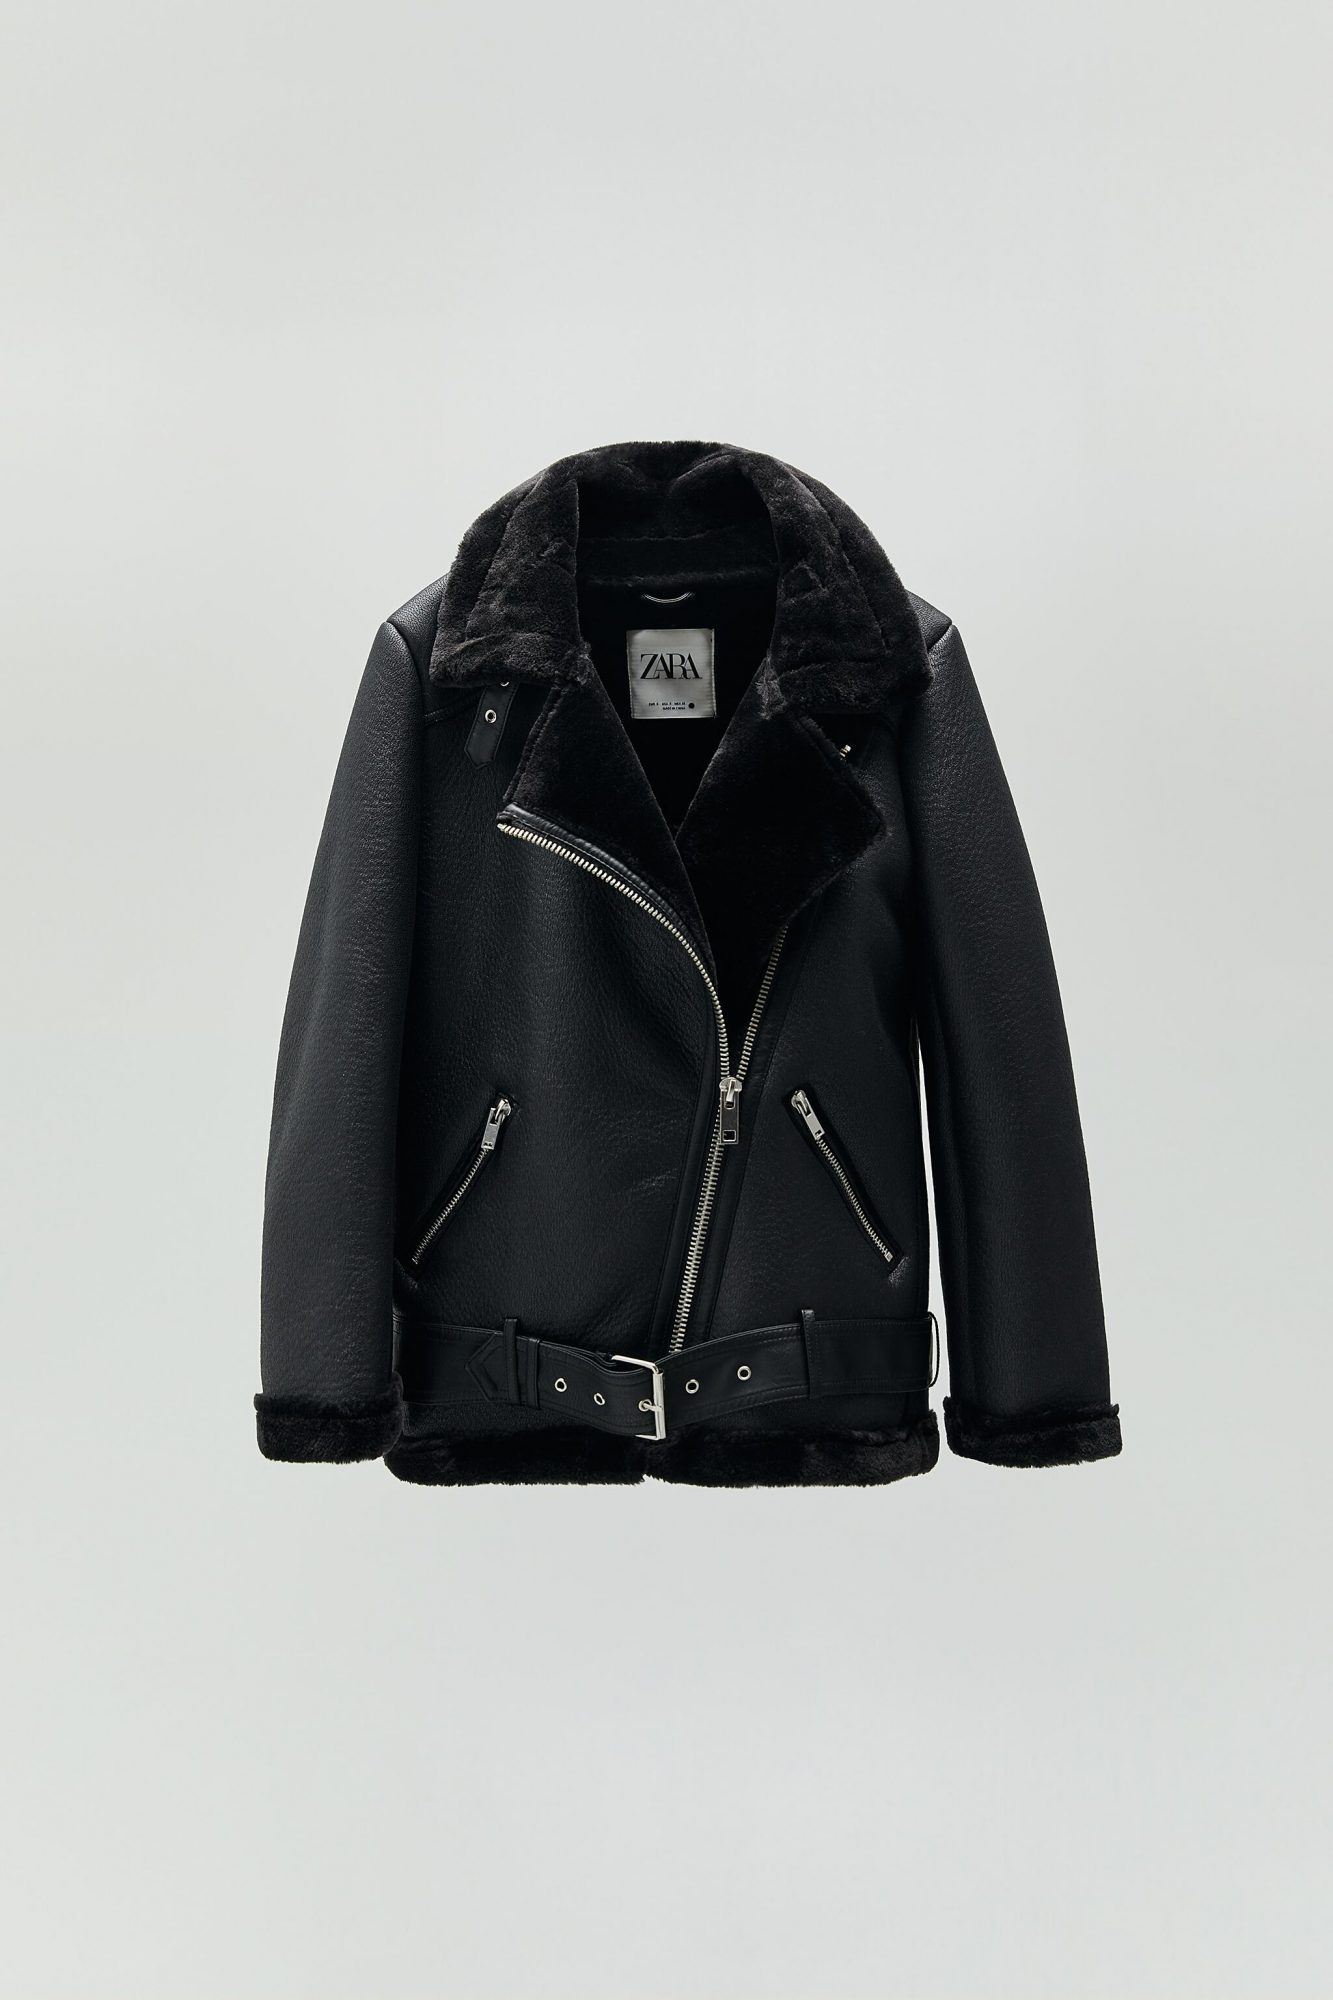 Jacket, Zara